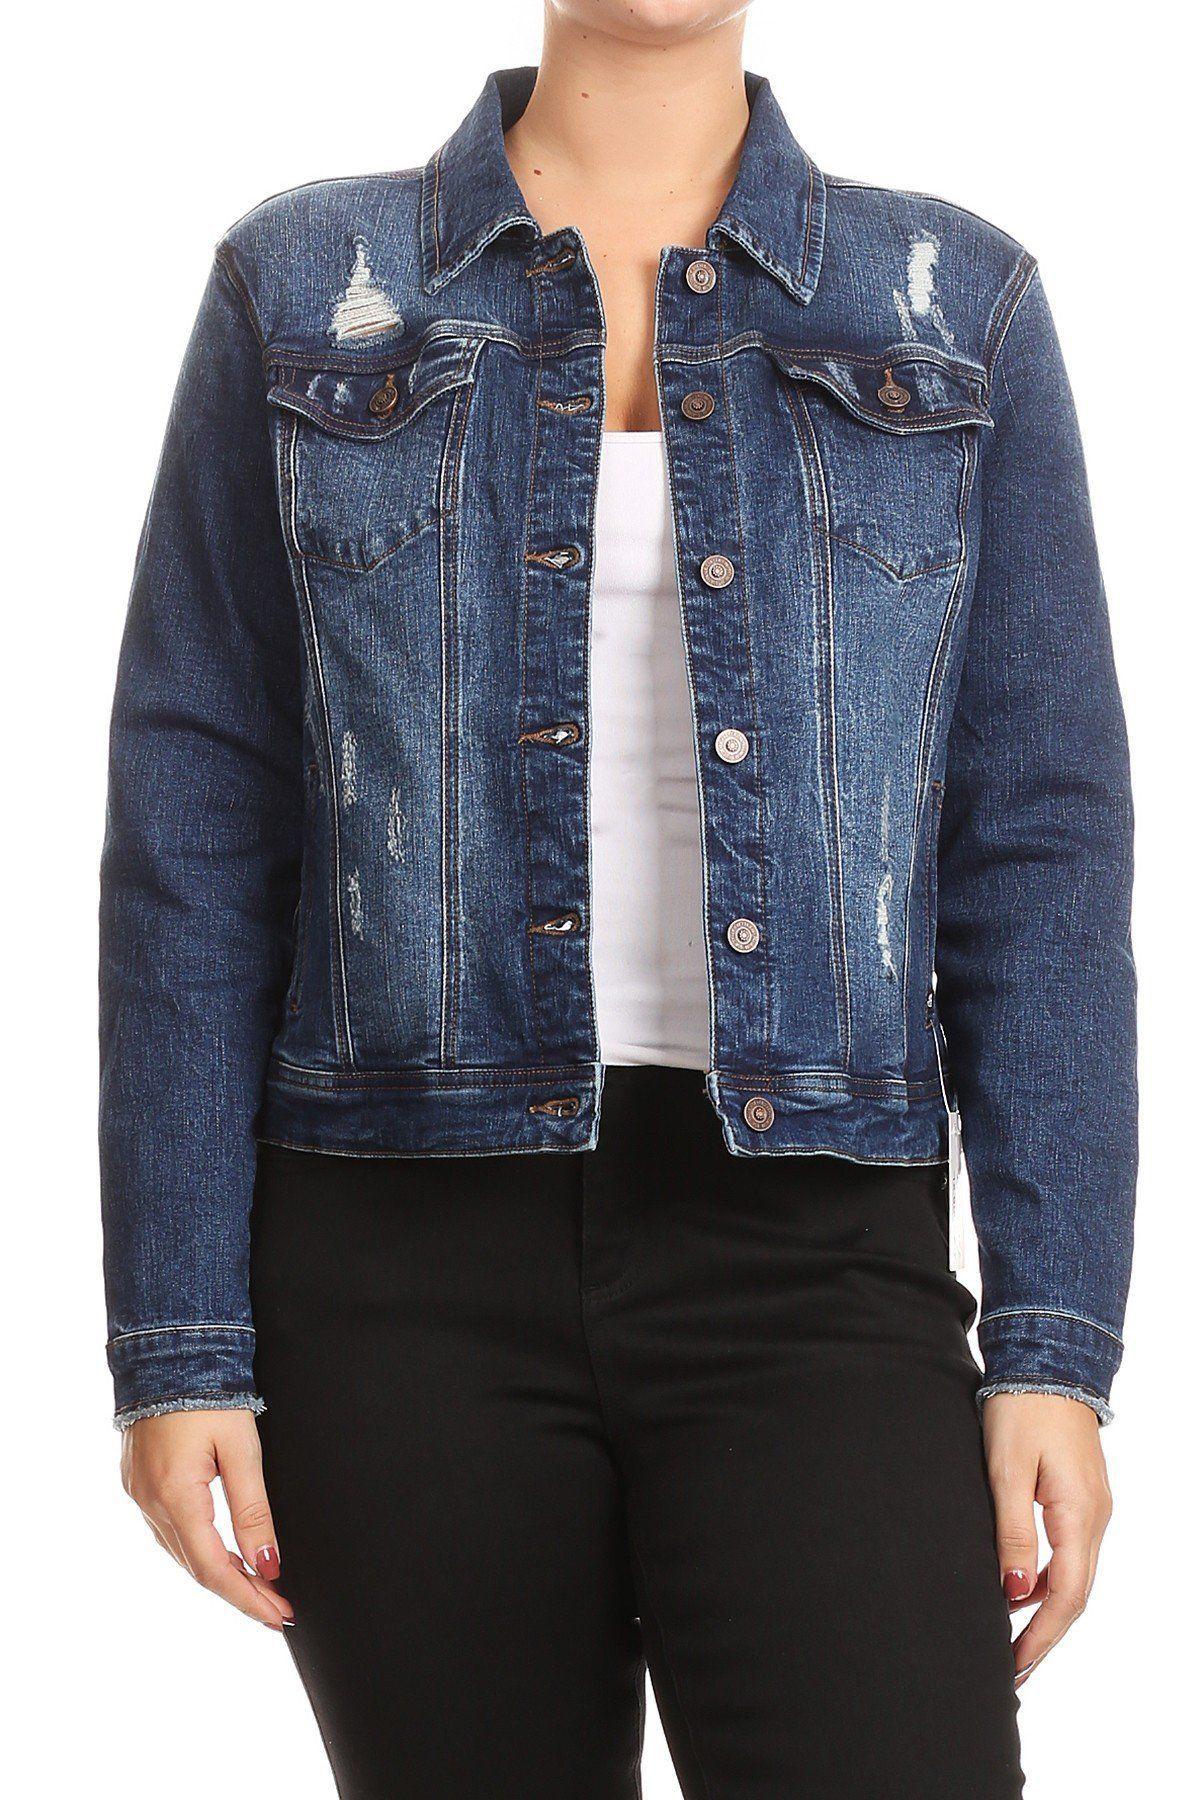 fe03b93d01f8 Salt Tree Women's EnJean Plus Size Distressed Washed Out Denim Jacket, US  seller